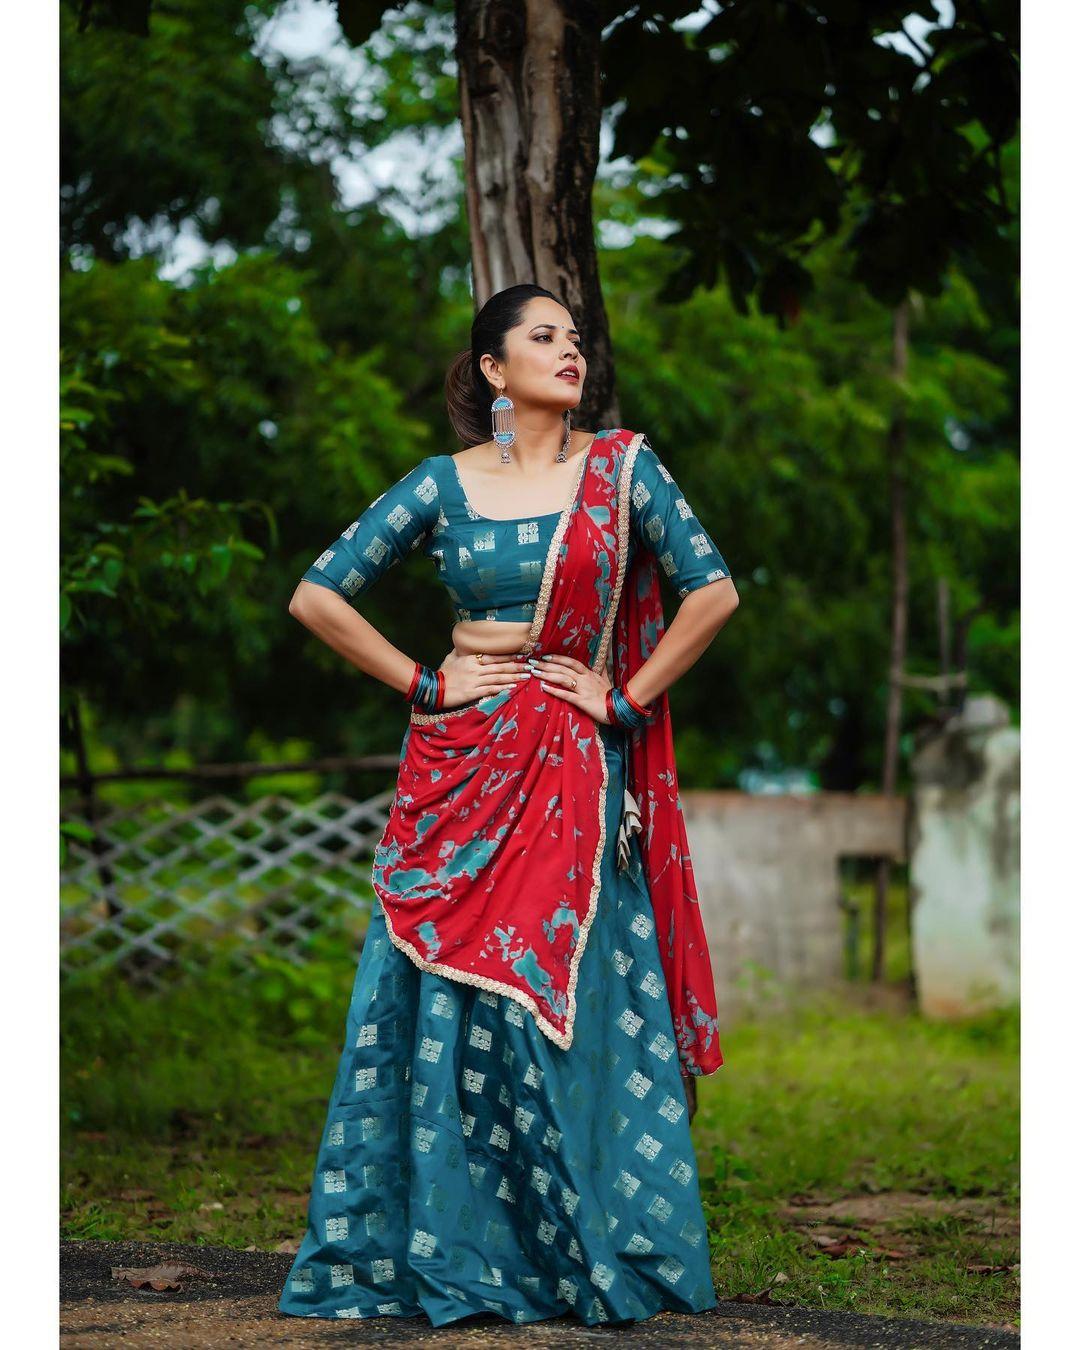 Anchor Anasuya : లేటెస్ట్ ఫోటో షూట్లో మెరిసిపోతున్న జబర్దస్త్ భామ అనసూయ..Photo : Instagram